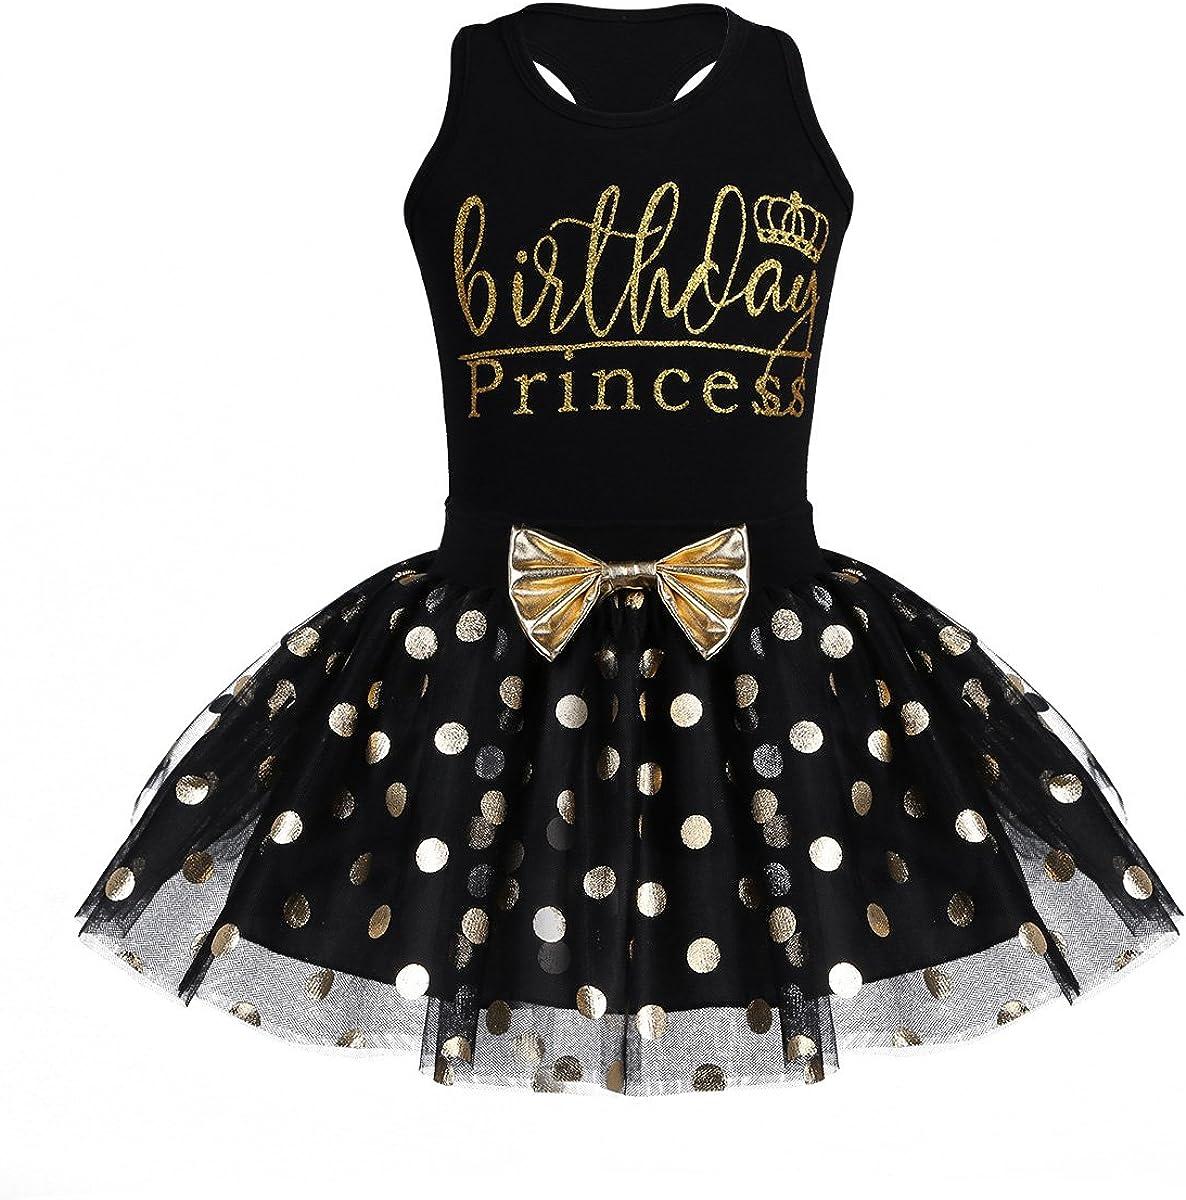 Nimiya Baby Infant Girls 2pcs Birthday Outfits Princess Shiny Sequins Polka Dots Racer-Back Shirt with Mesh Tutu Skirt Set